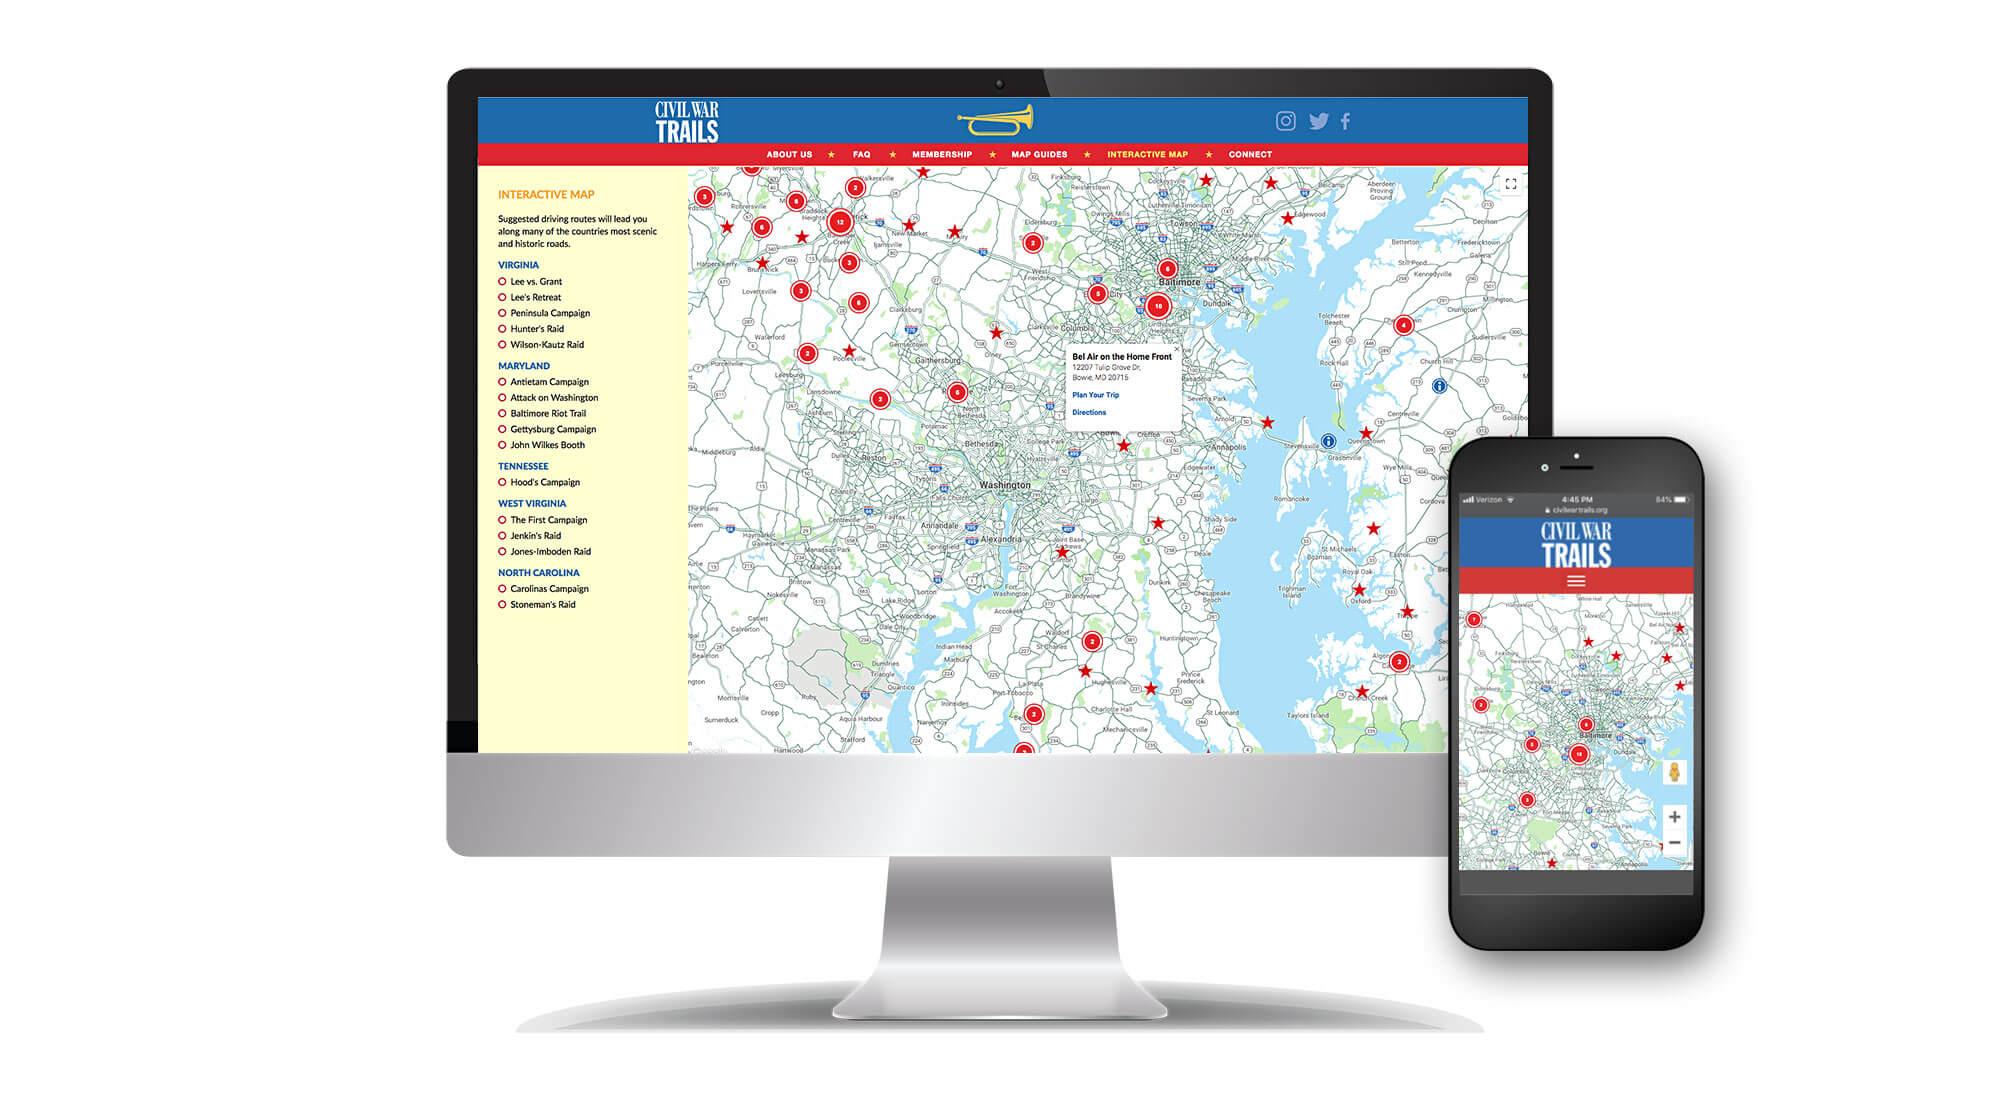 Civil War Trails website